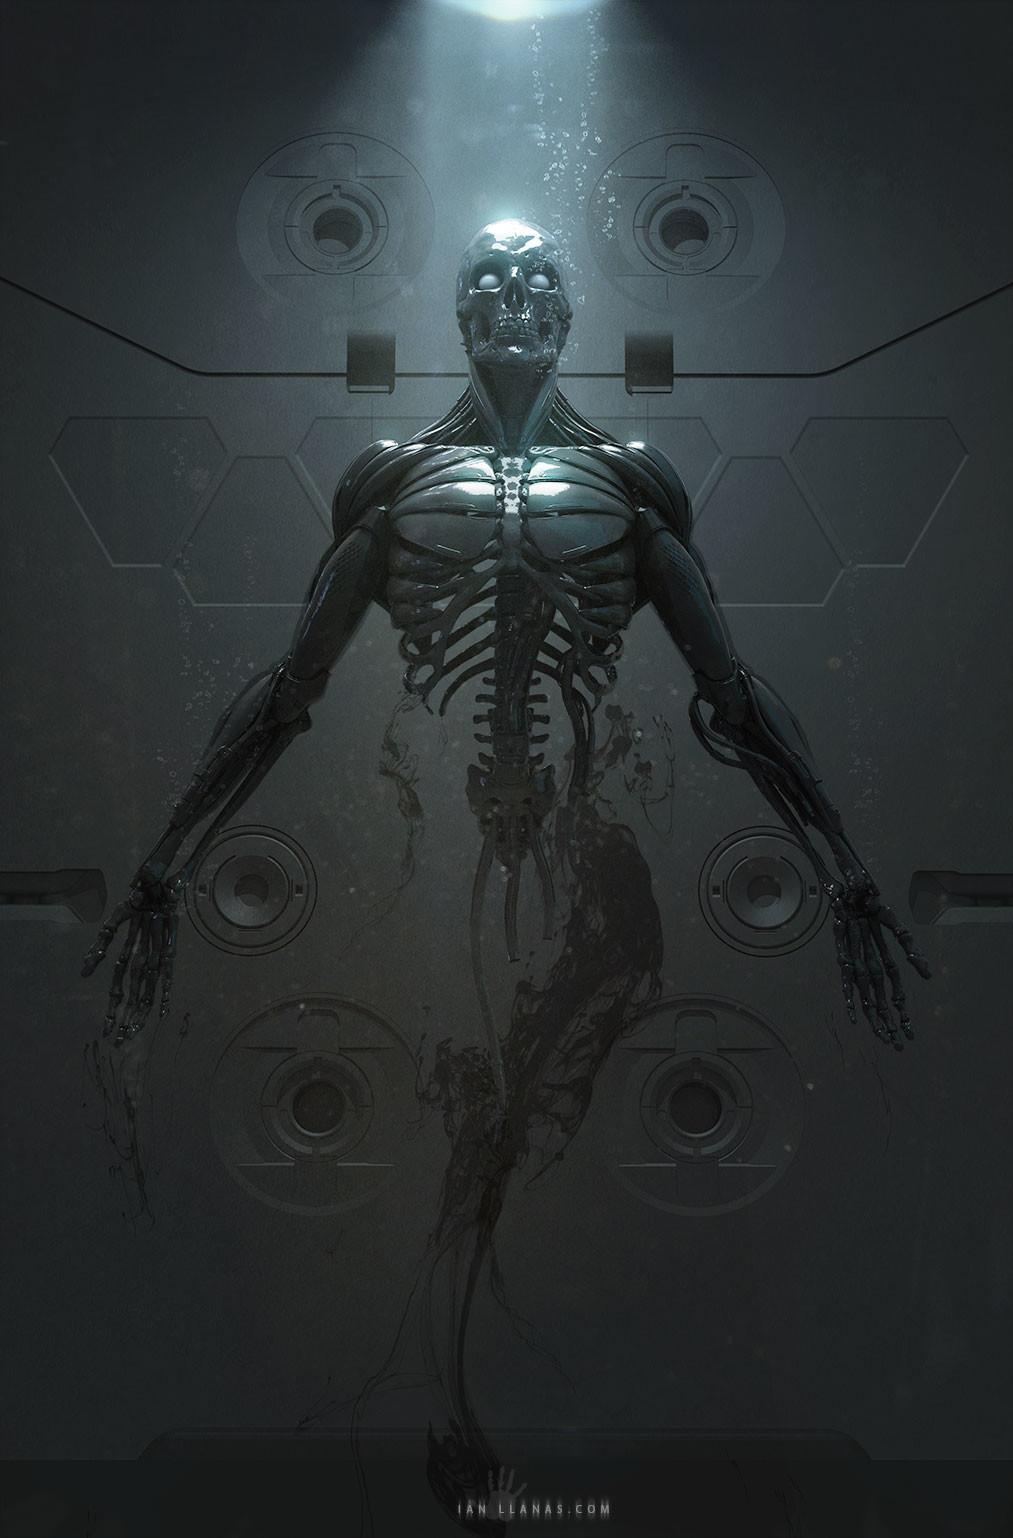 Print available - https://www.inprnt.com/gallery/ianllanas/cyborg-birth/